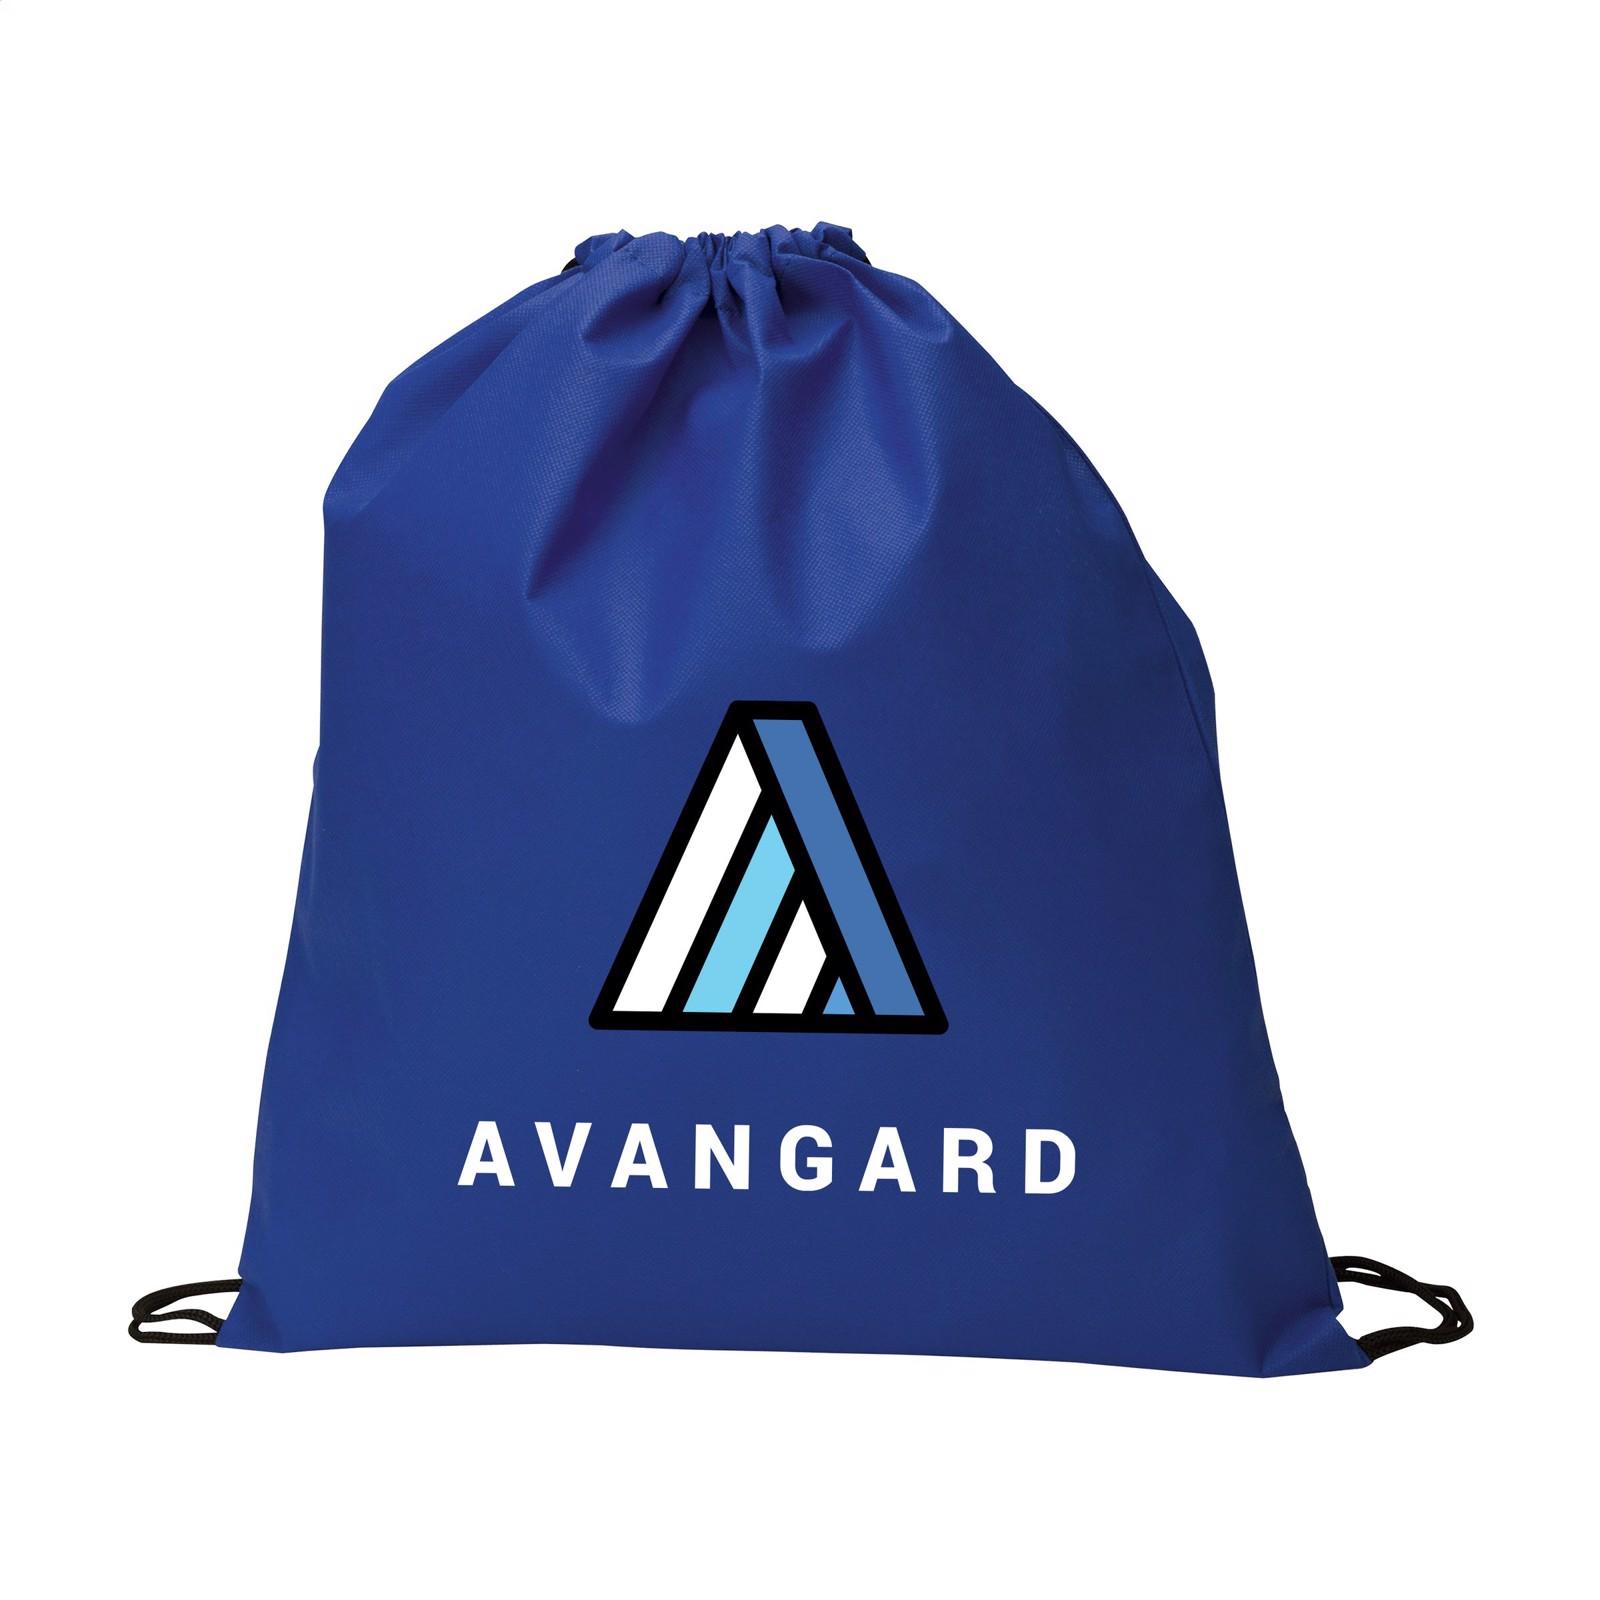 Non-Woven PromoBag backpack - Cobalt Blue